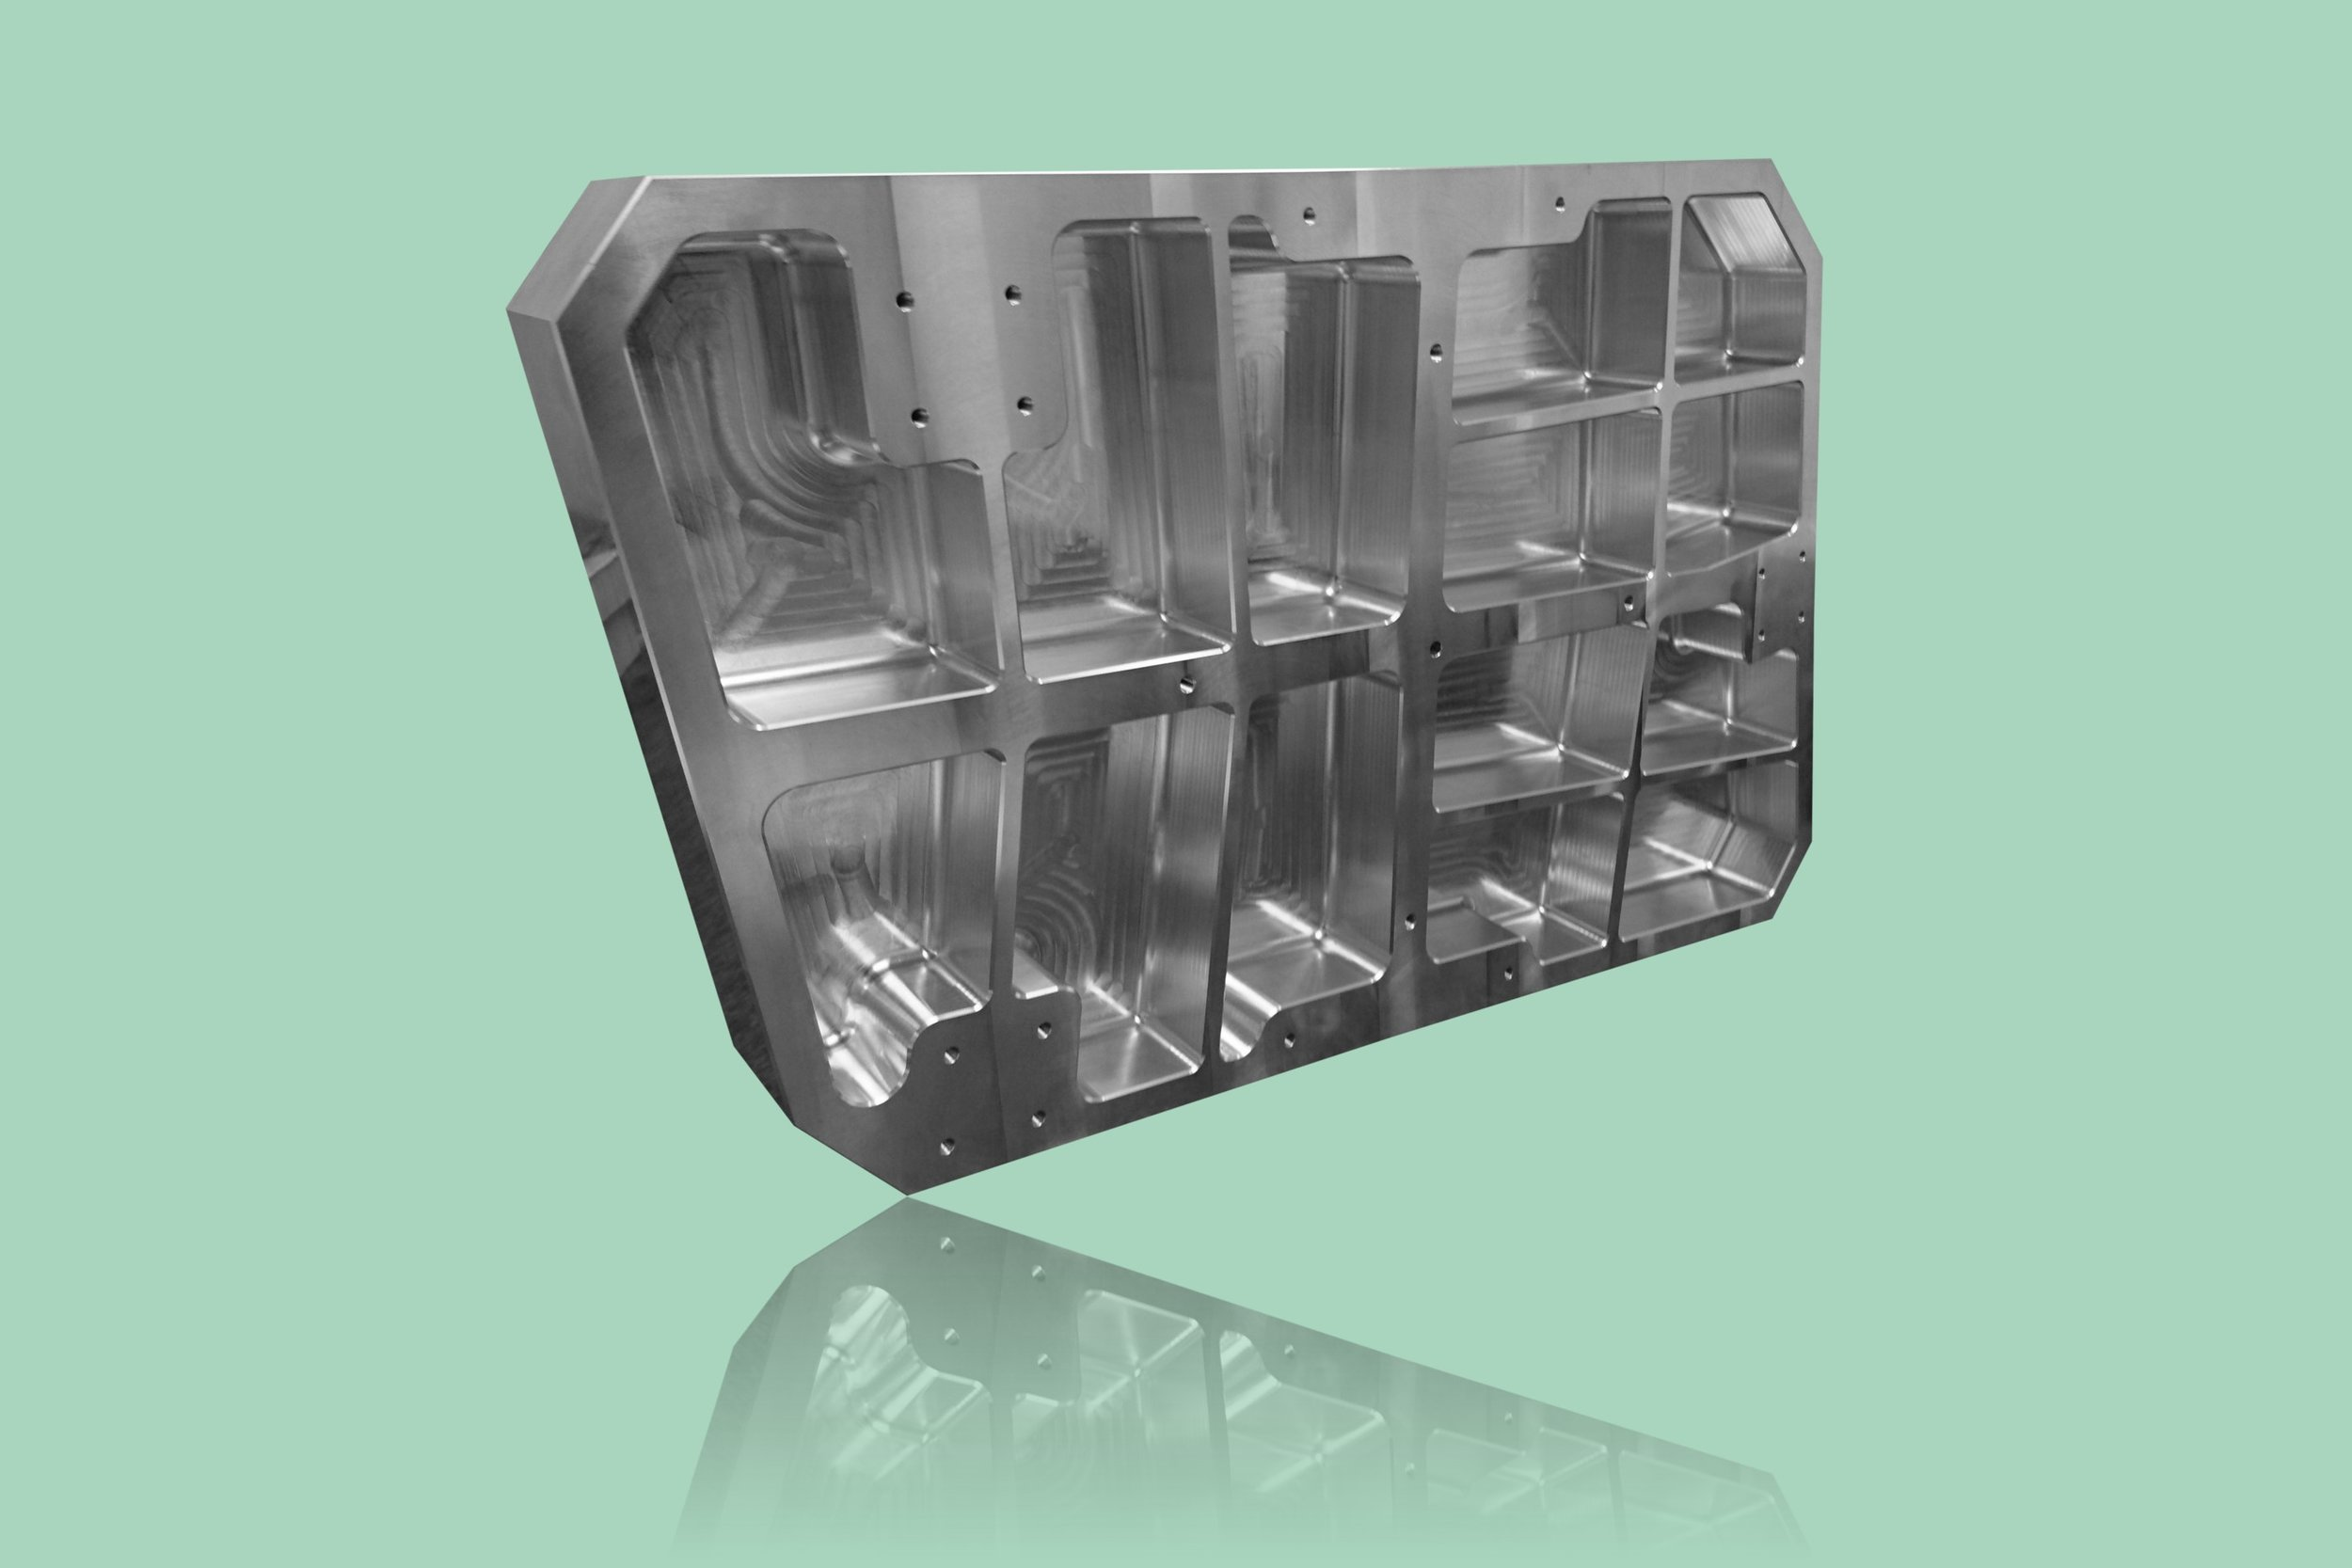 Enkeltstyk produktion fræst i aluminium Branche: Elektronik